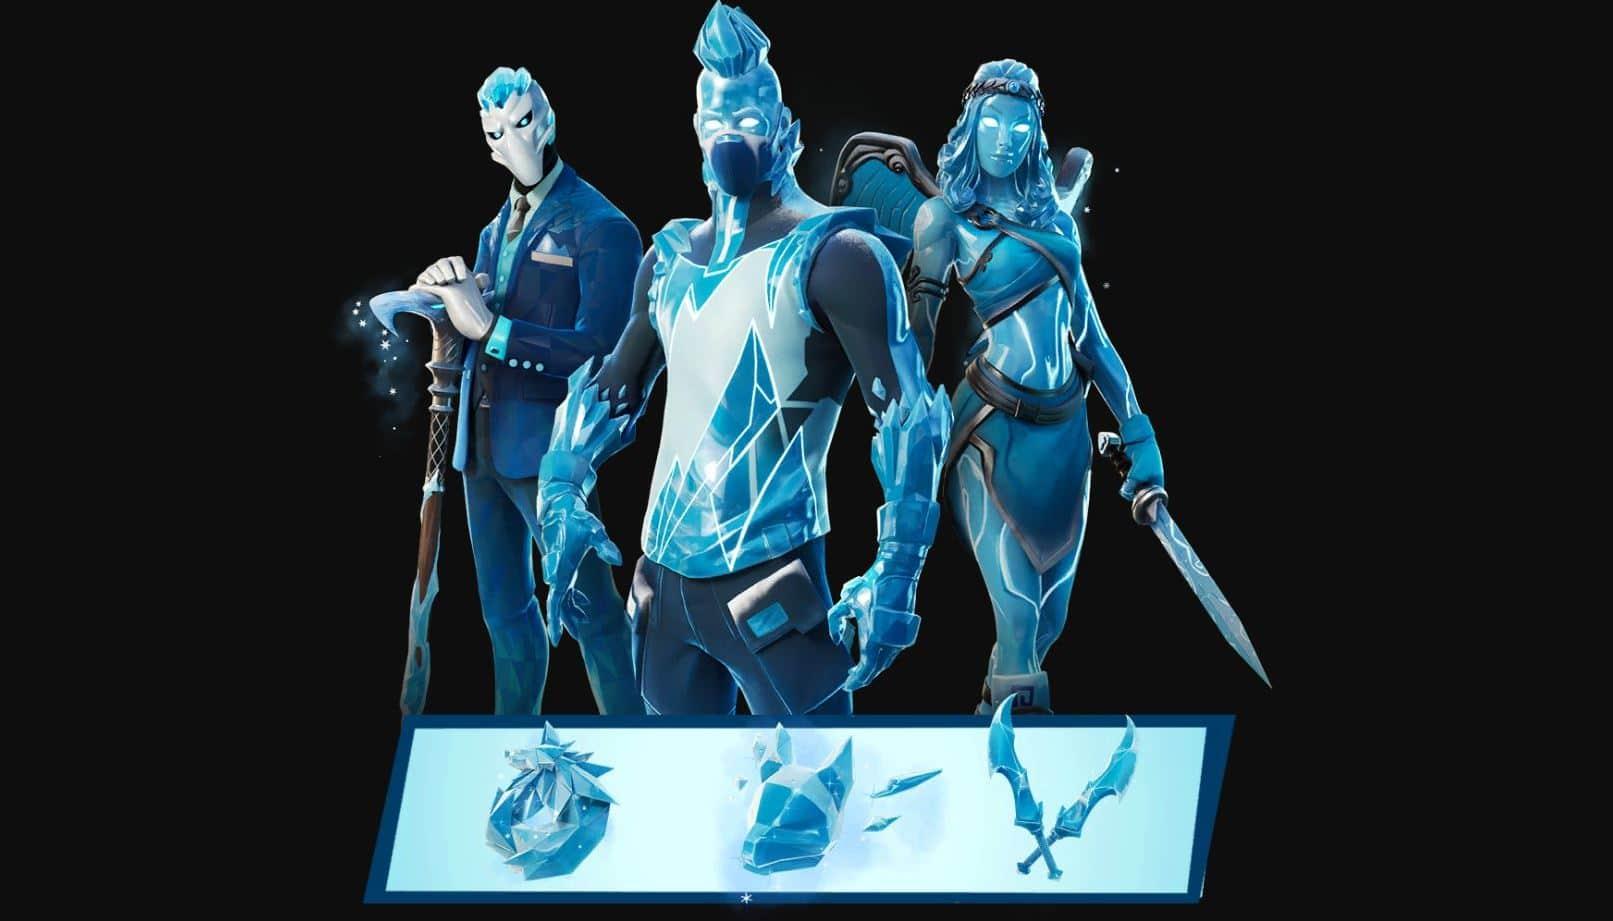 Frost Legends Fortnite Pack